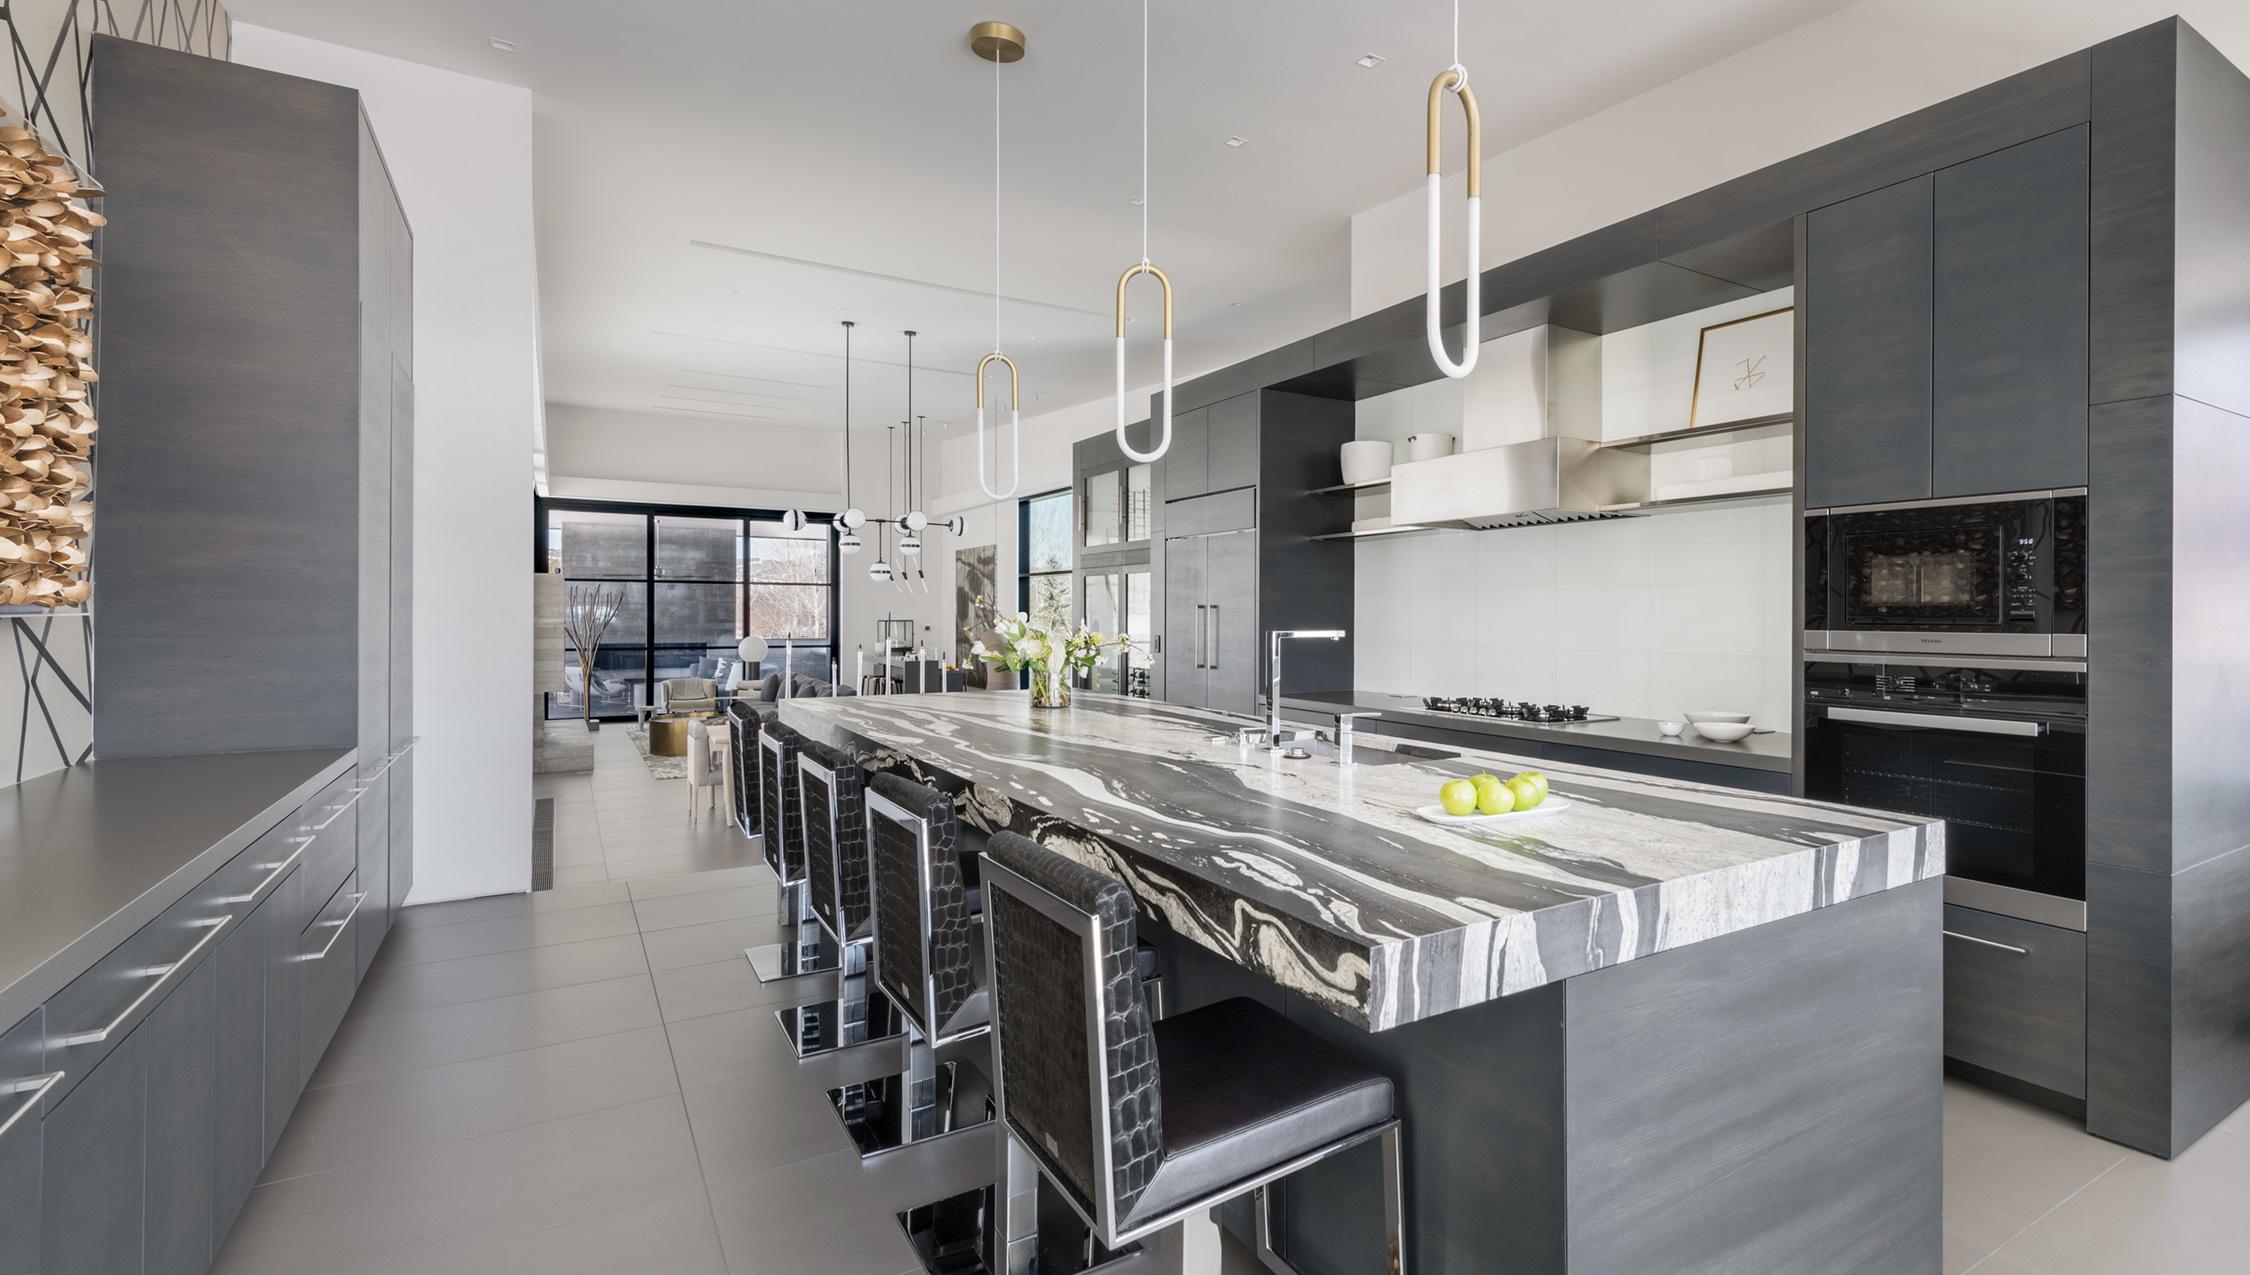 Ccy Architects Maroon Creek Overlook Kitchen